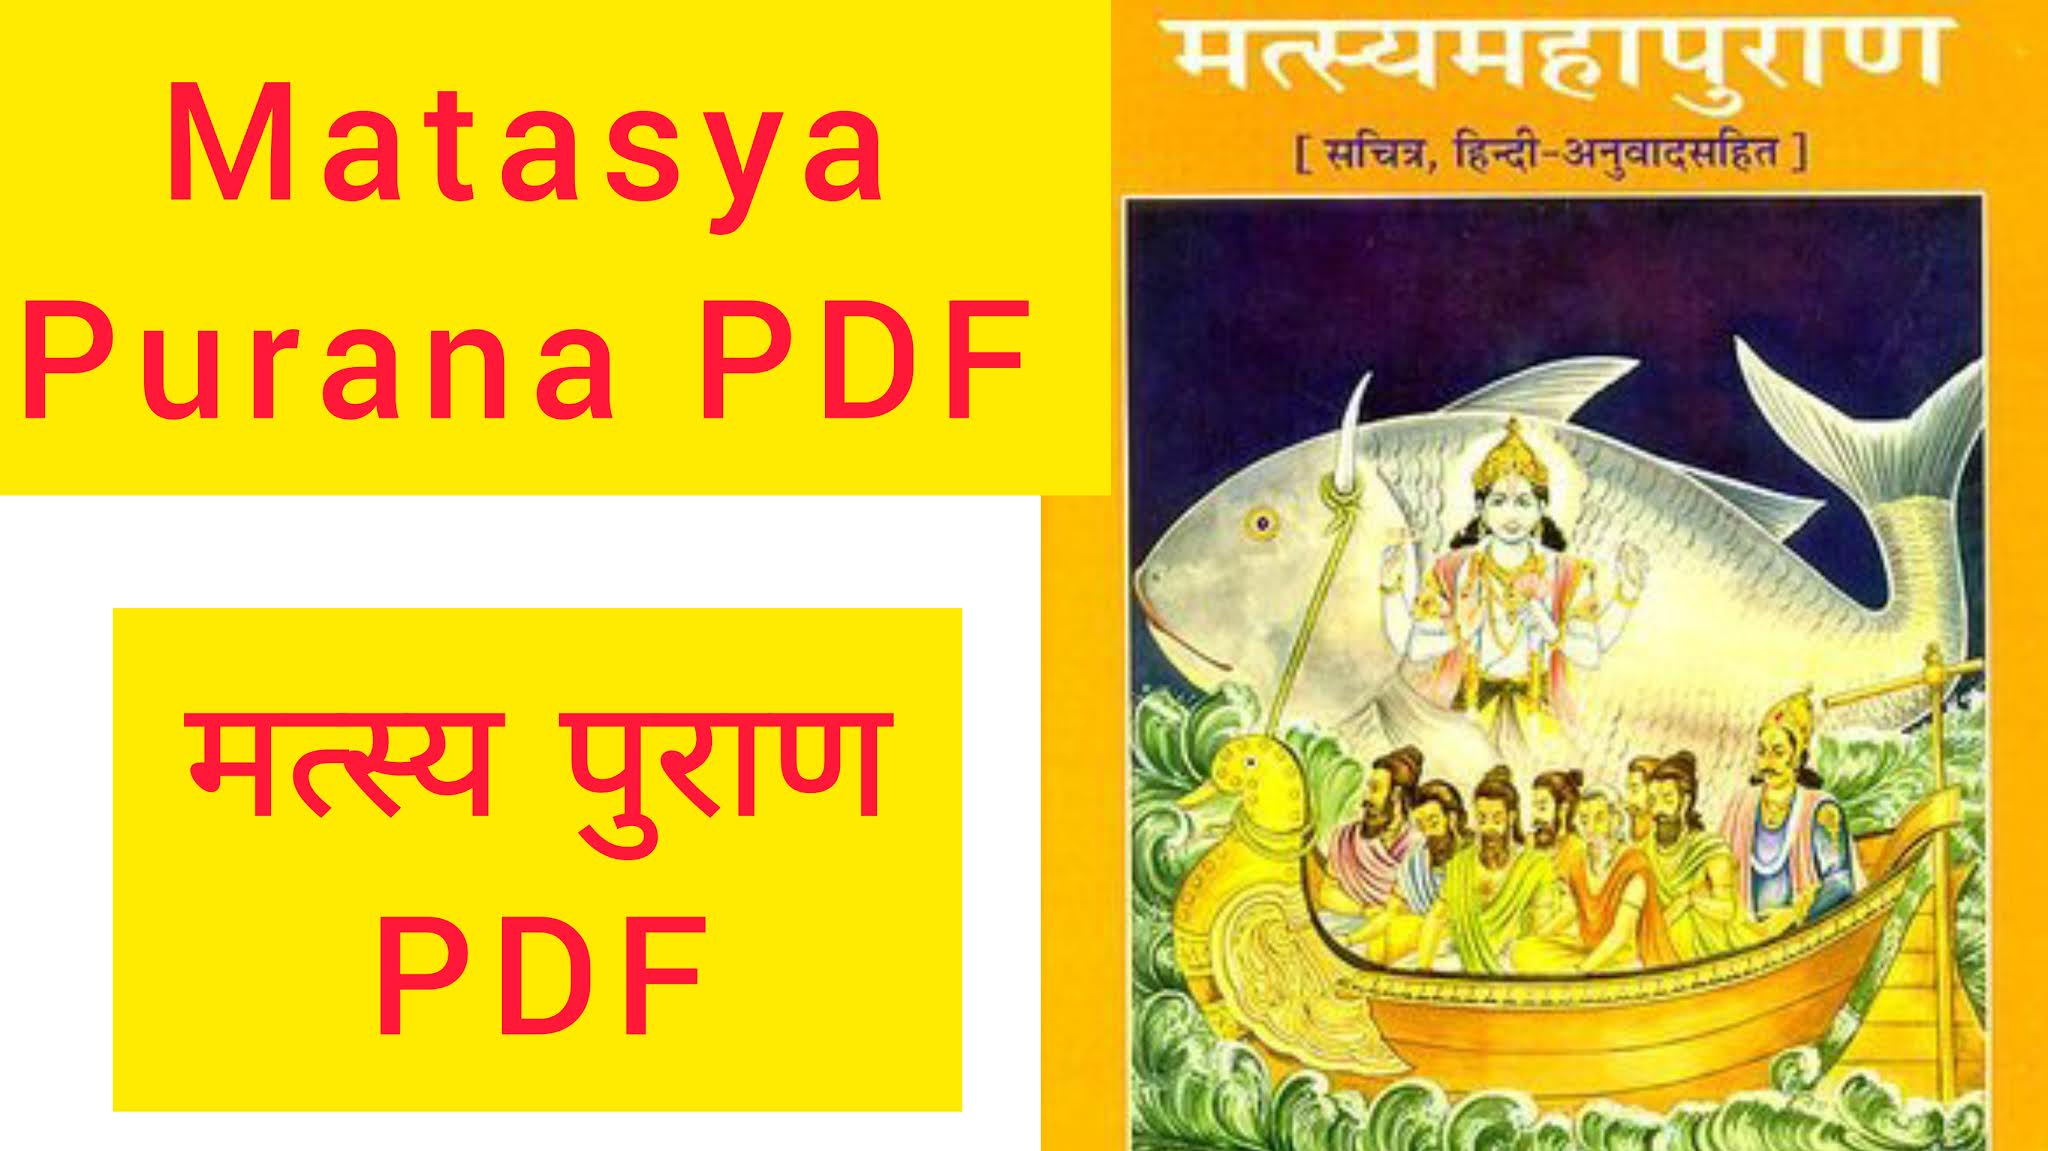 Matsya Purana PDF